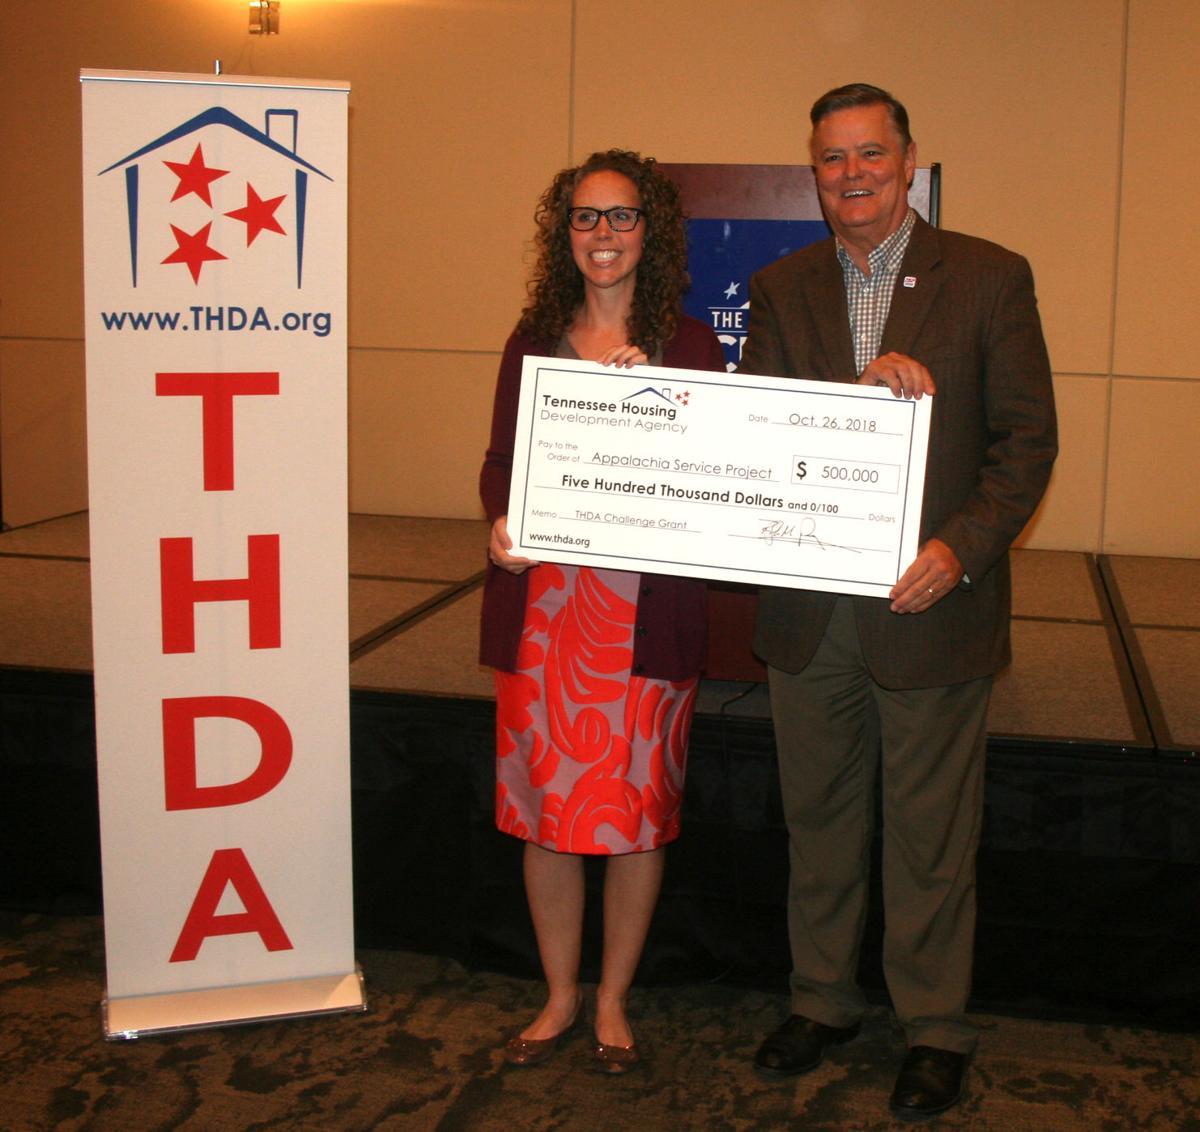 THDA grant to kickstart major expansion of Appalachia Service Project